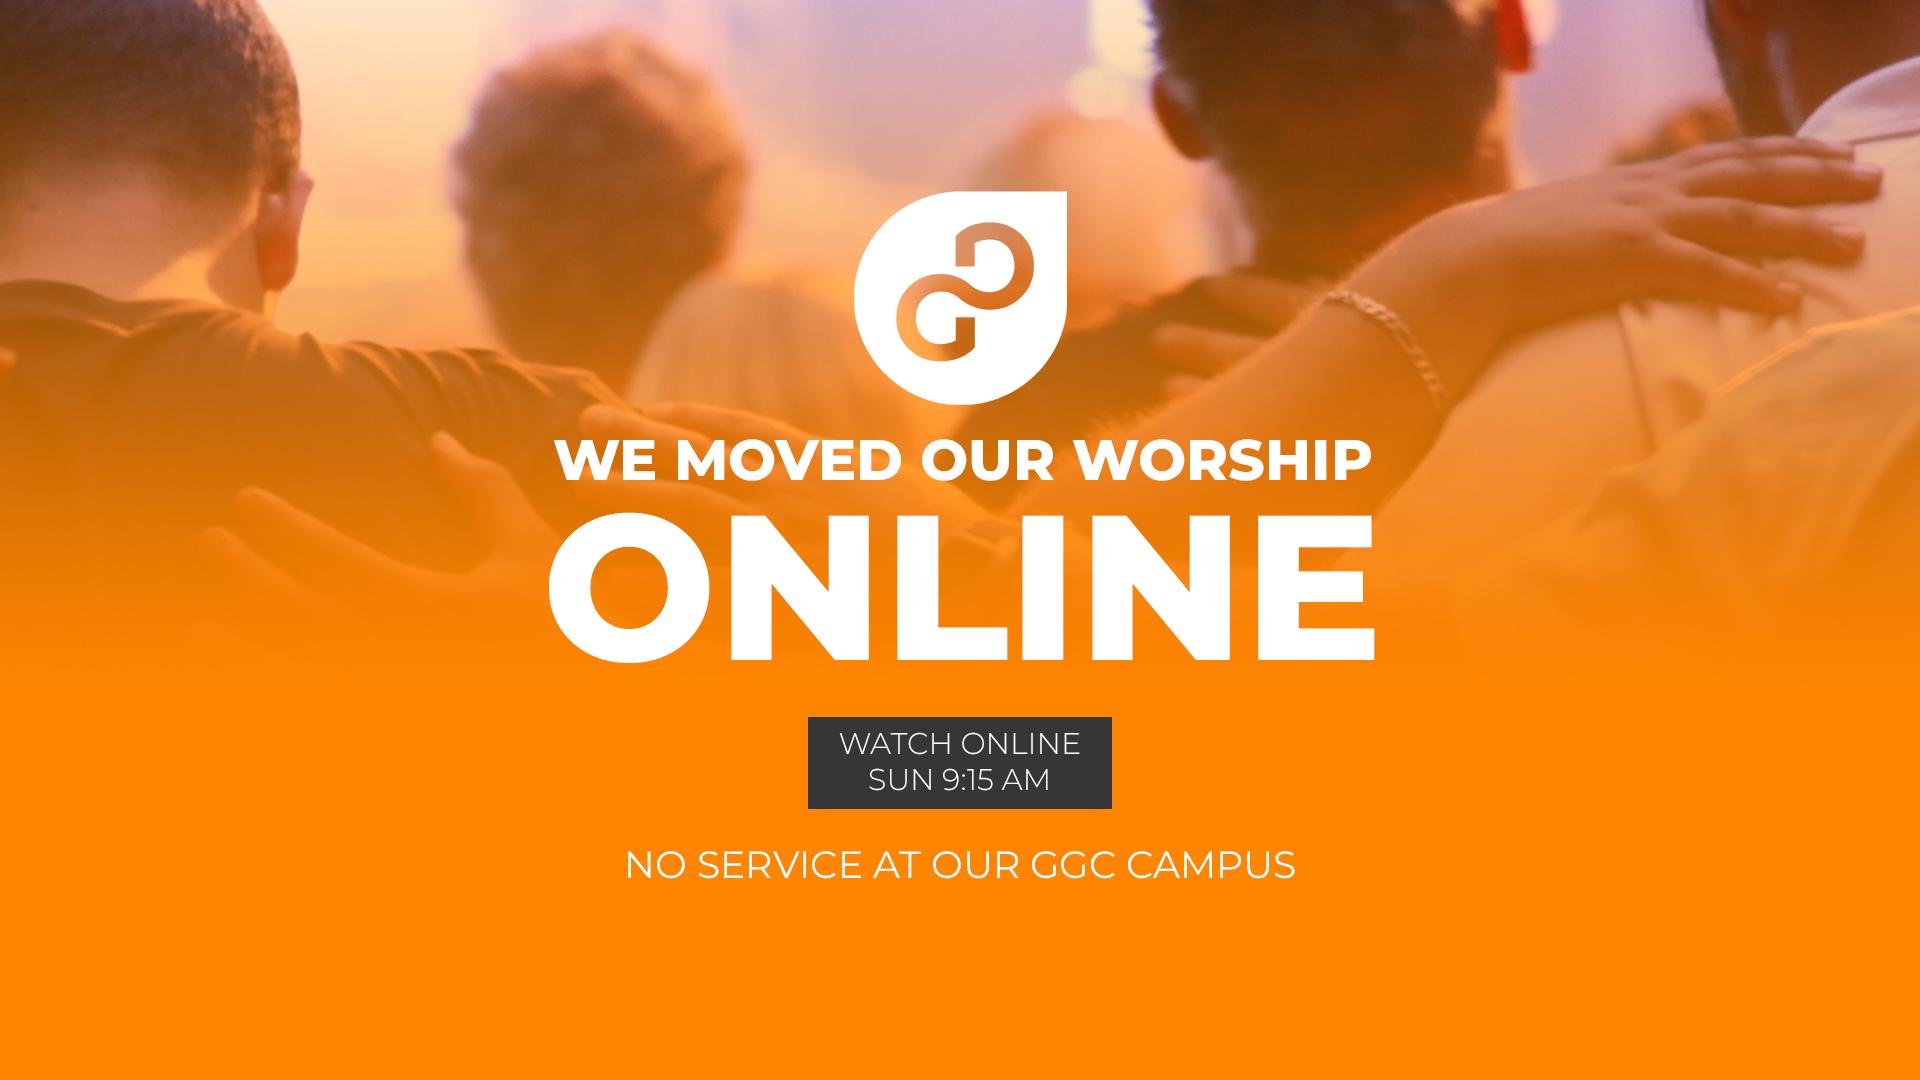 online worship service, gulf gate church, near siesta key beach